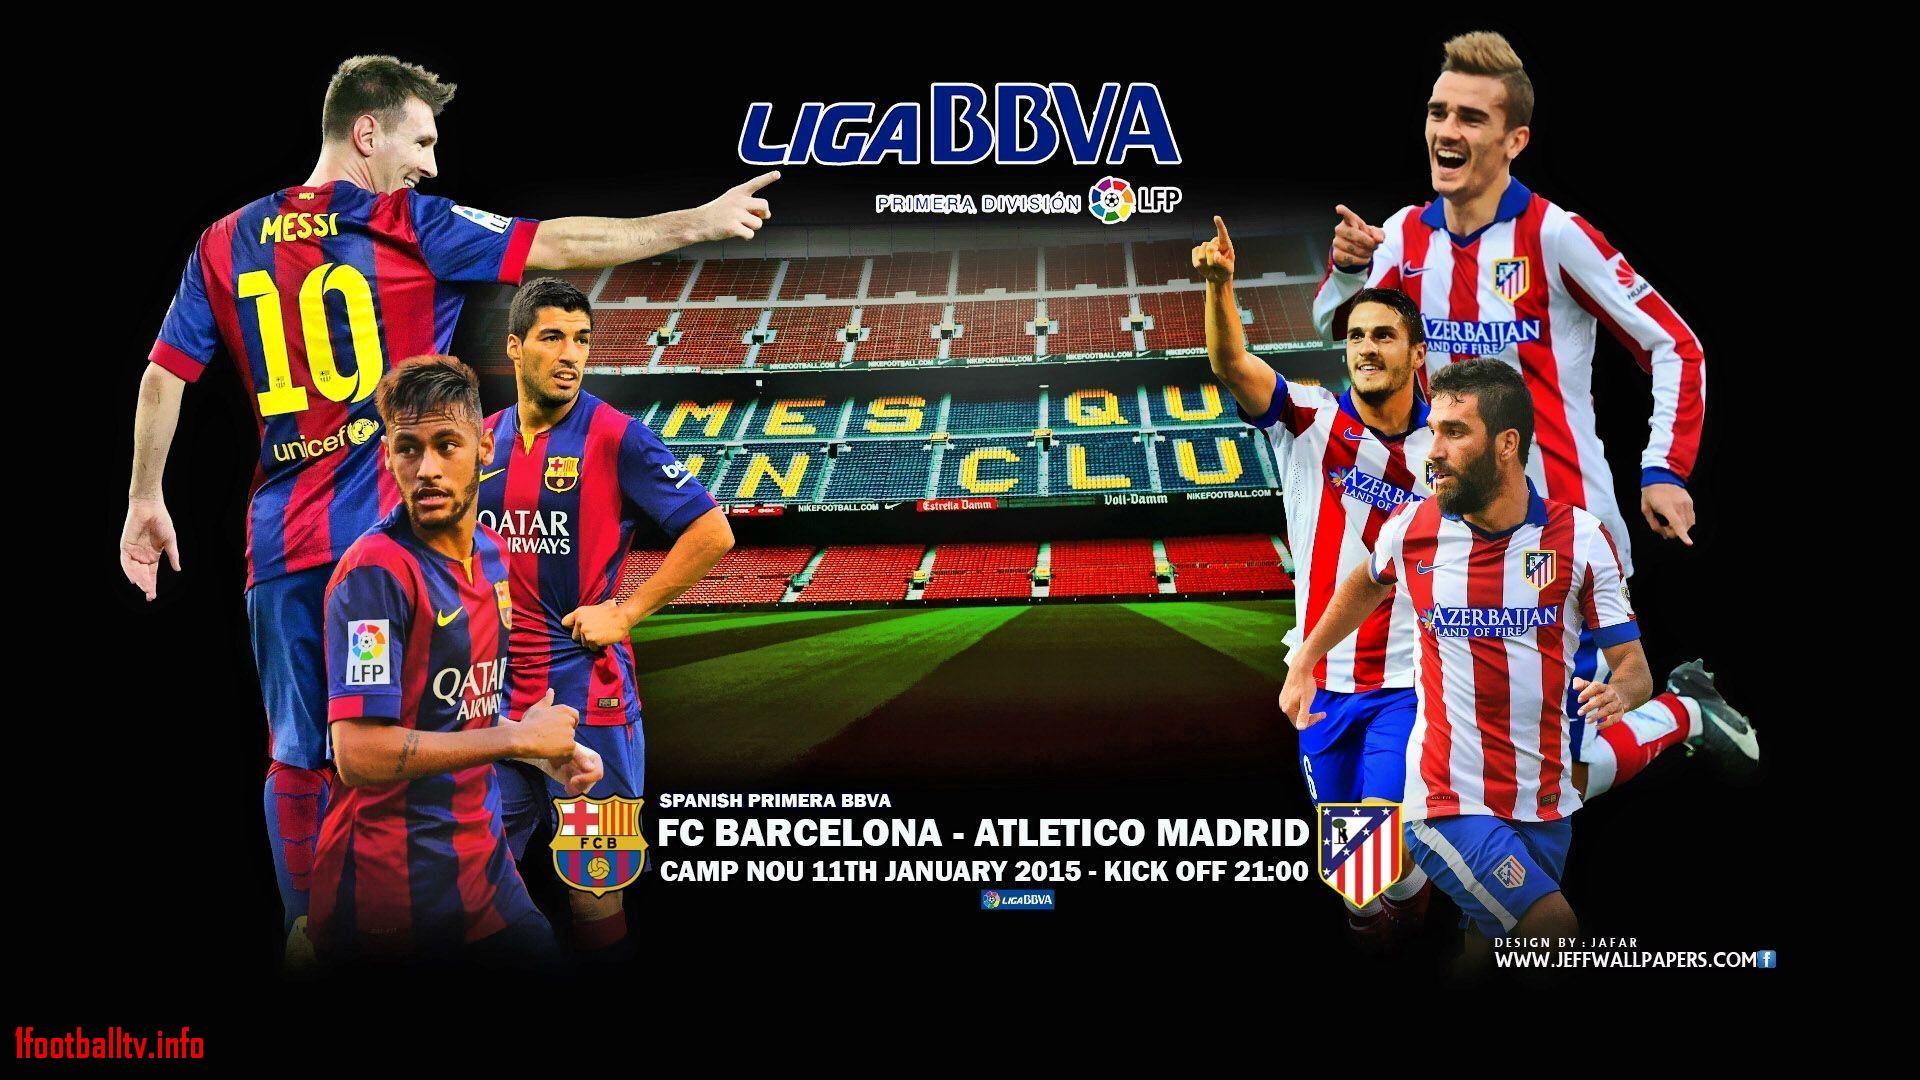 Luxury Fc Barcelona Vs Real Madrid Liga Bbva Zat3   Best 1920x1080